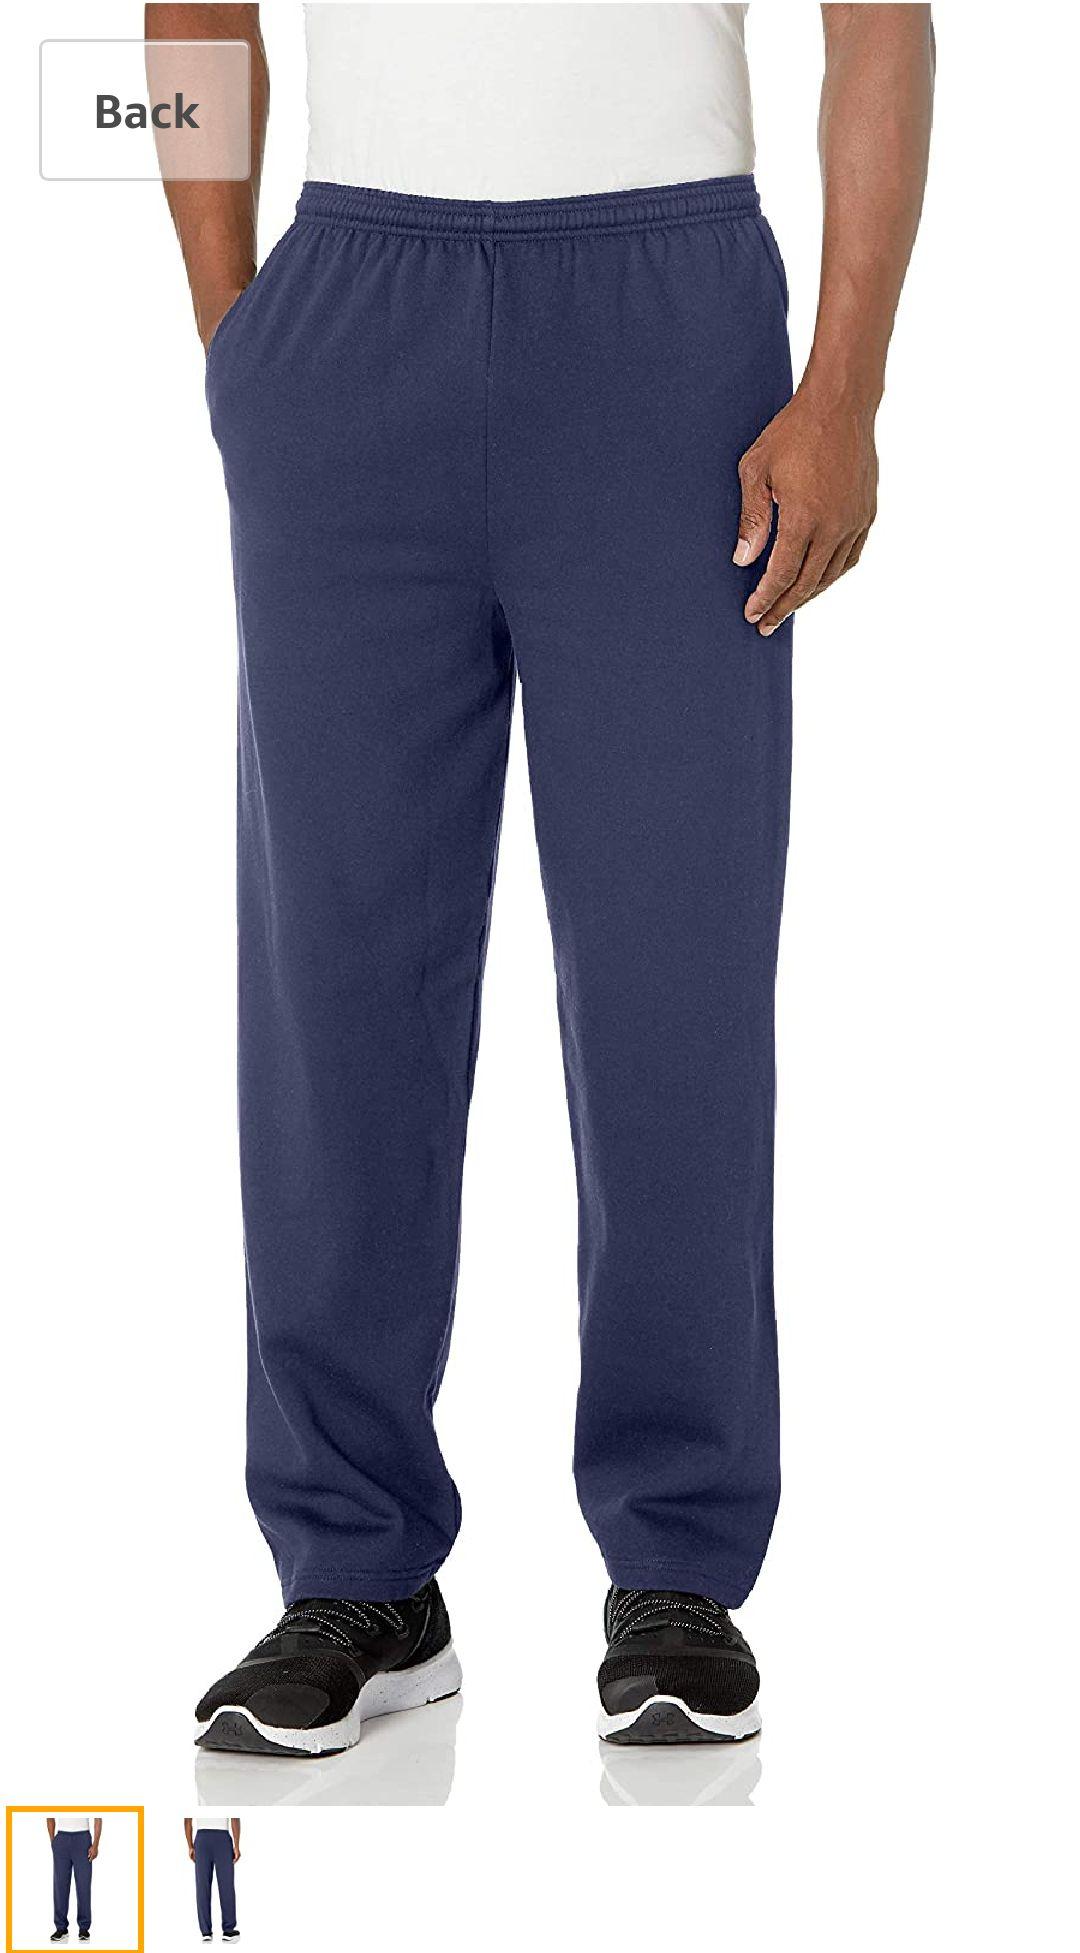 Hanes男生运动裤 mens Ecosmart Fleece Sweatpant With Pocket Pants, Navy, Large US at Amazon Men's Clothing store